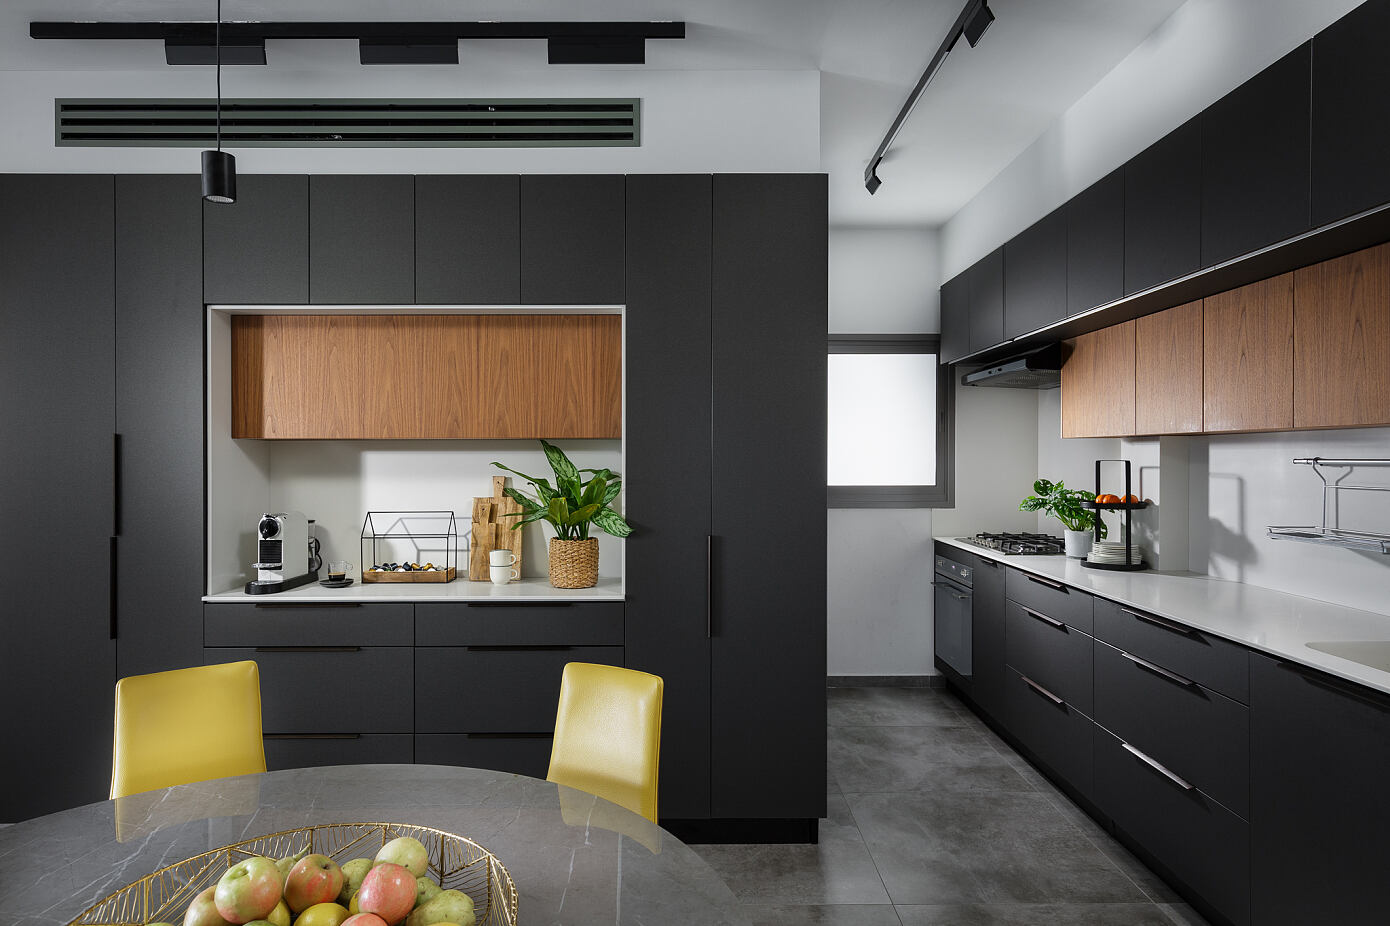 Apartment in Ganey Tikva by Amit Kedar